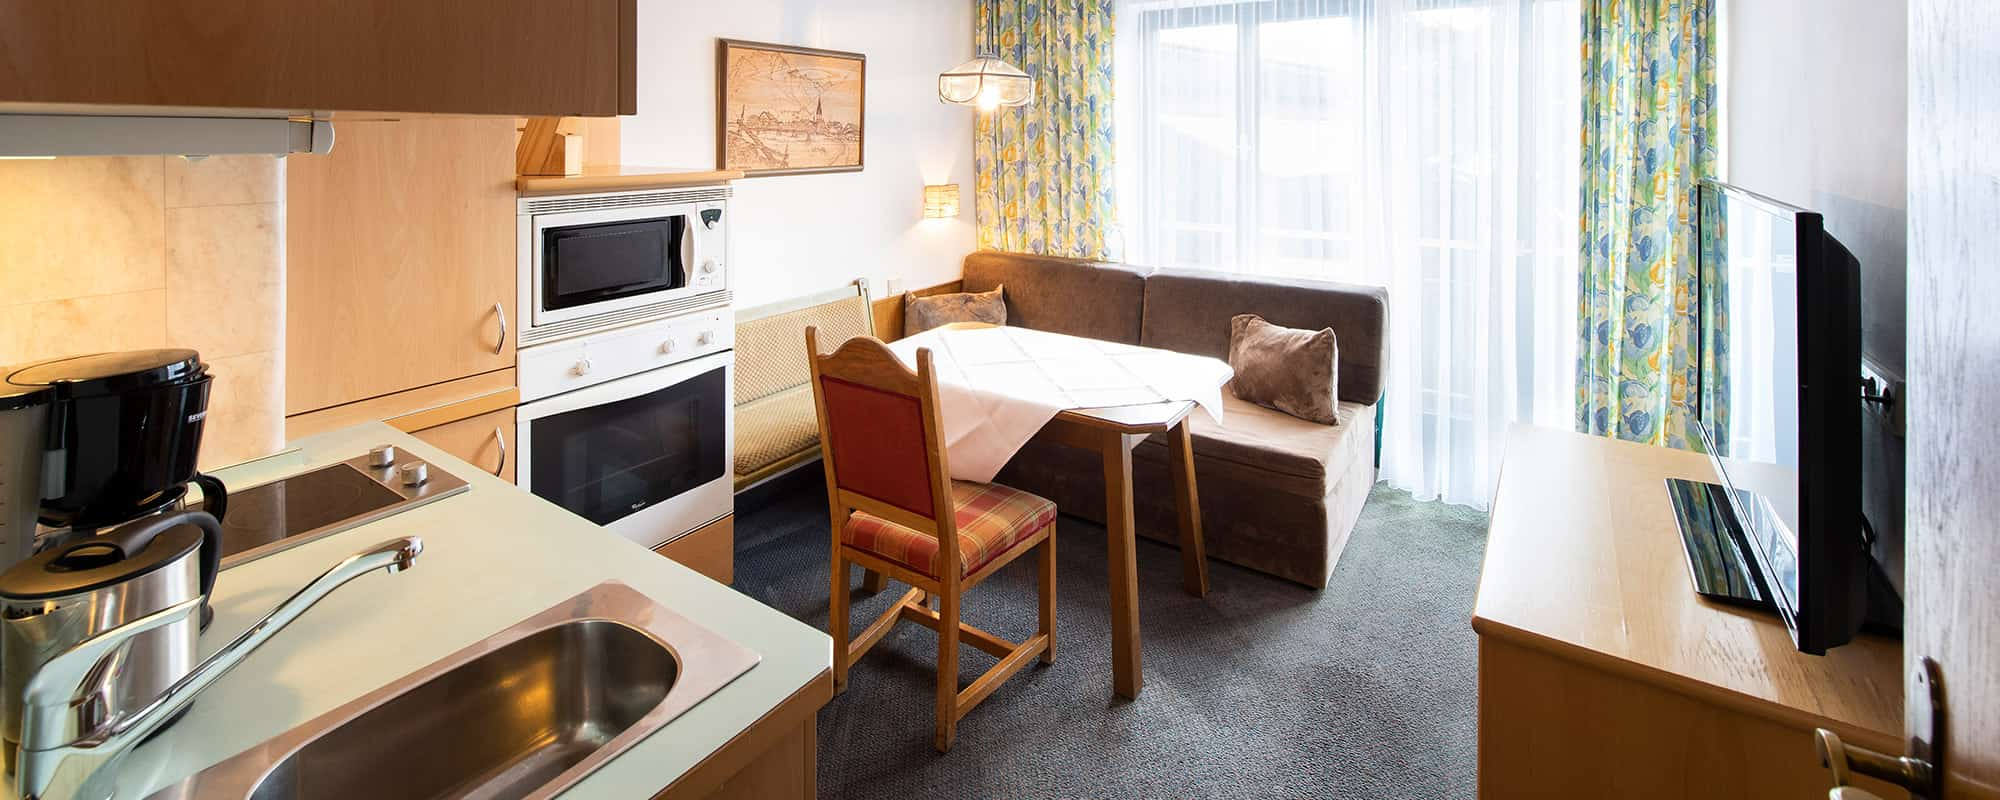 MANNI low budget vollausgetattete Apartments